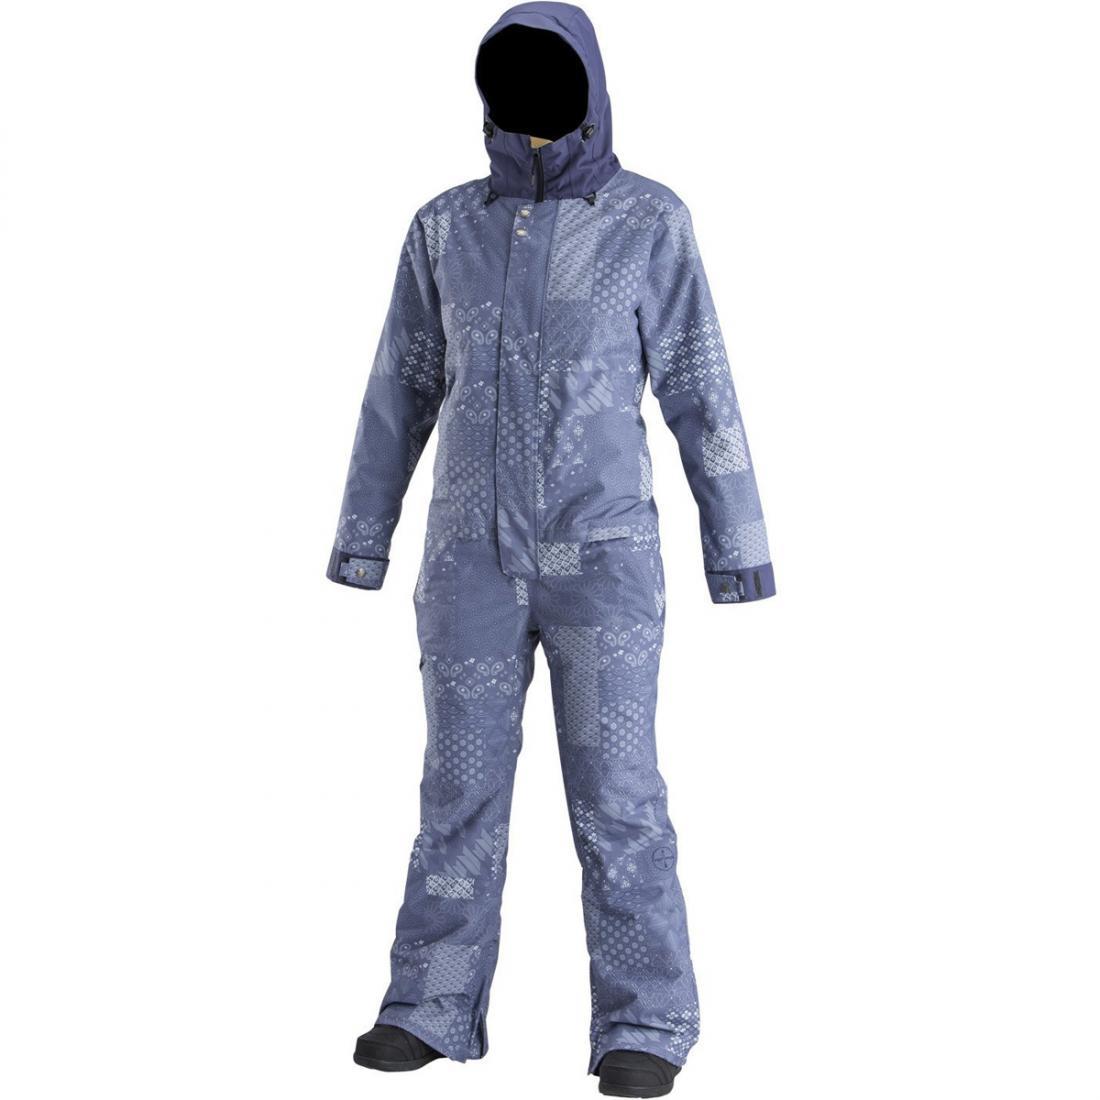 Сноубордический комбинезон Airblaster Women's Insulated Freedom Suit купить в Boardshop №1